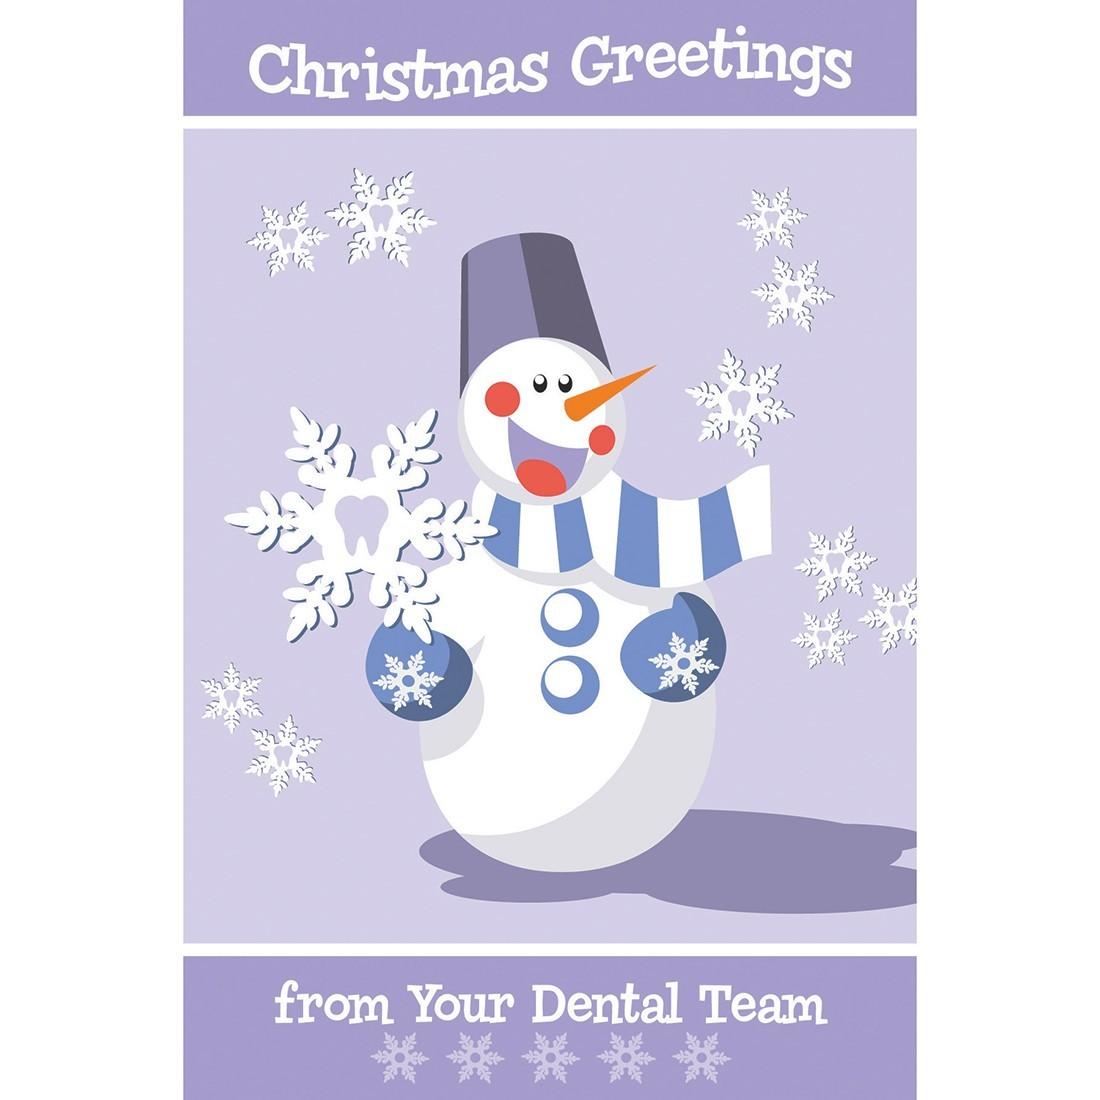 Christmas Greetings Greeting Cards [image]